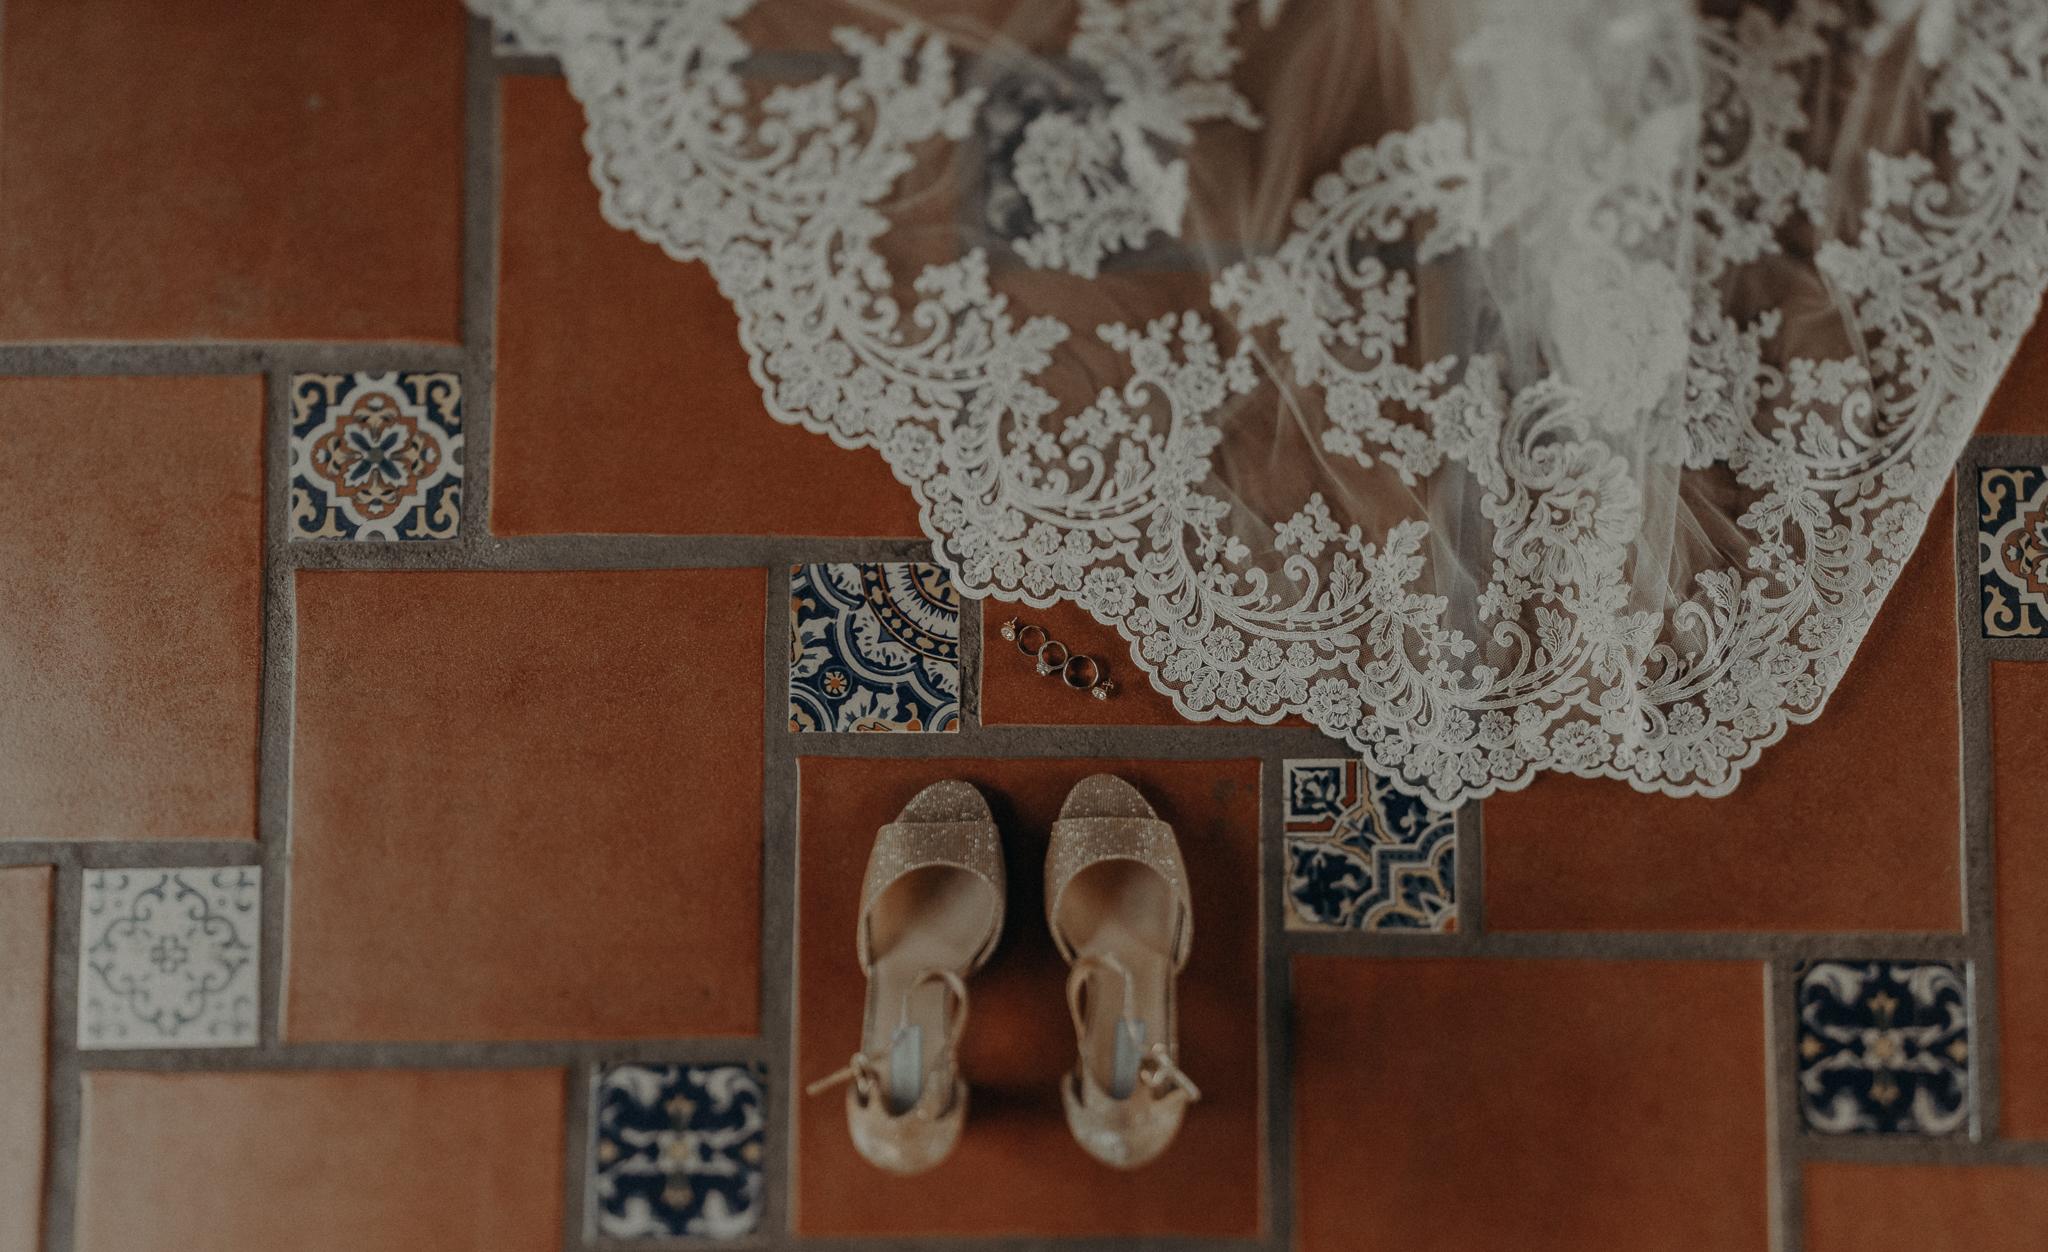 Isaiah + Taylor Photography - Rancho Las Lomas Wedding, Los Angeles Wedding Photographer-003.jpg